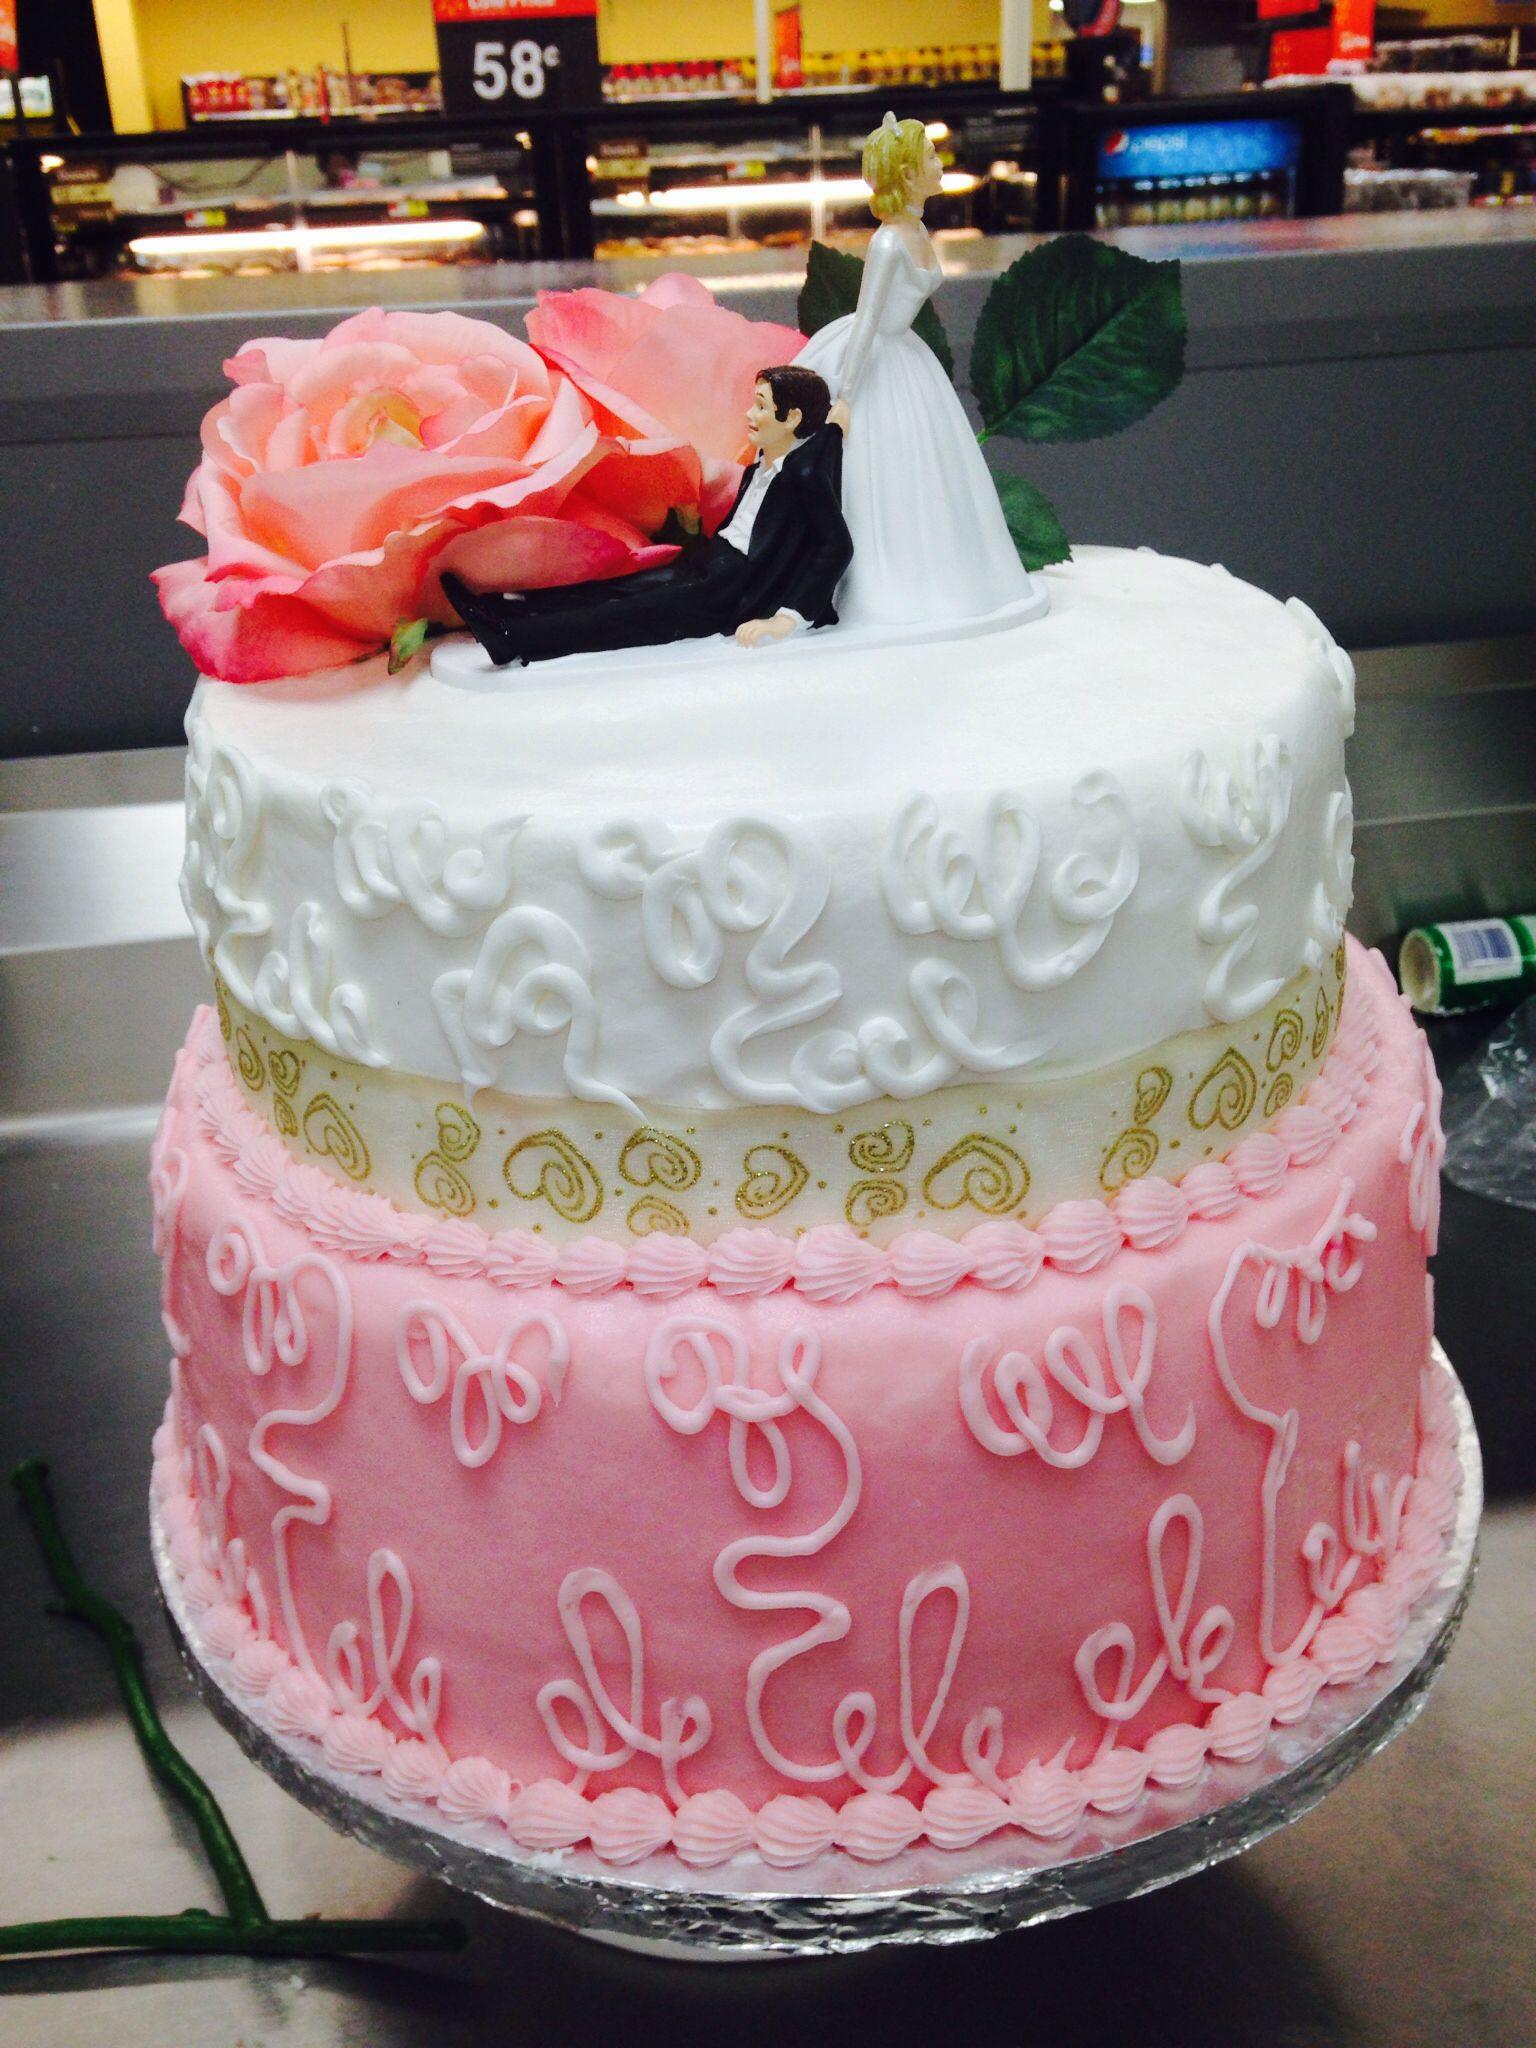 Walmart 3 Tier Wedding Cakes  Two tier wedding cake Walmart Walmart cakes